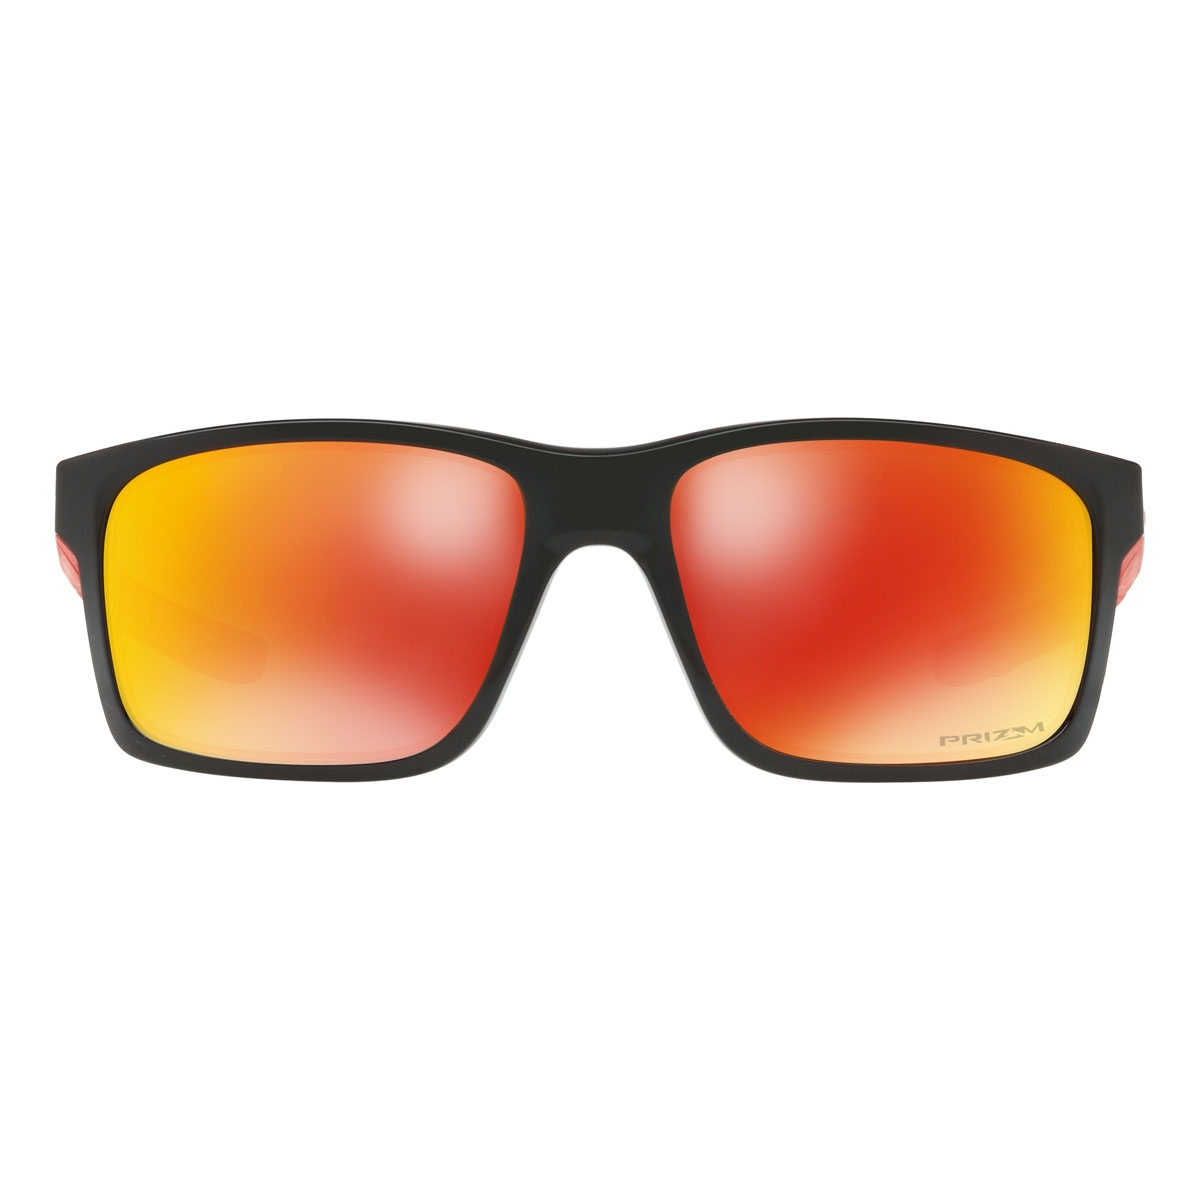 ce2e1fb39d ... Image of Oakley Mainlink Prizm Polarised Sunglasses - Polished Black  Frame Prizm Ruby Polarized Lens